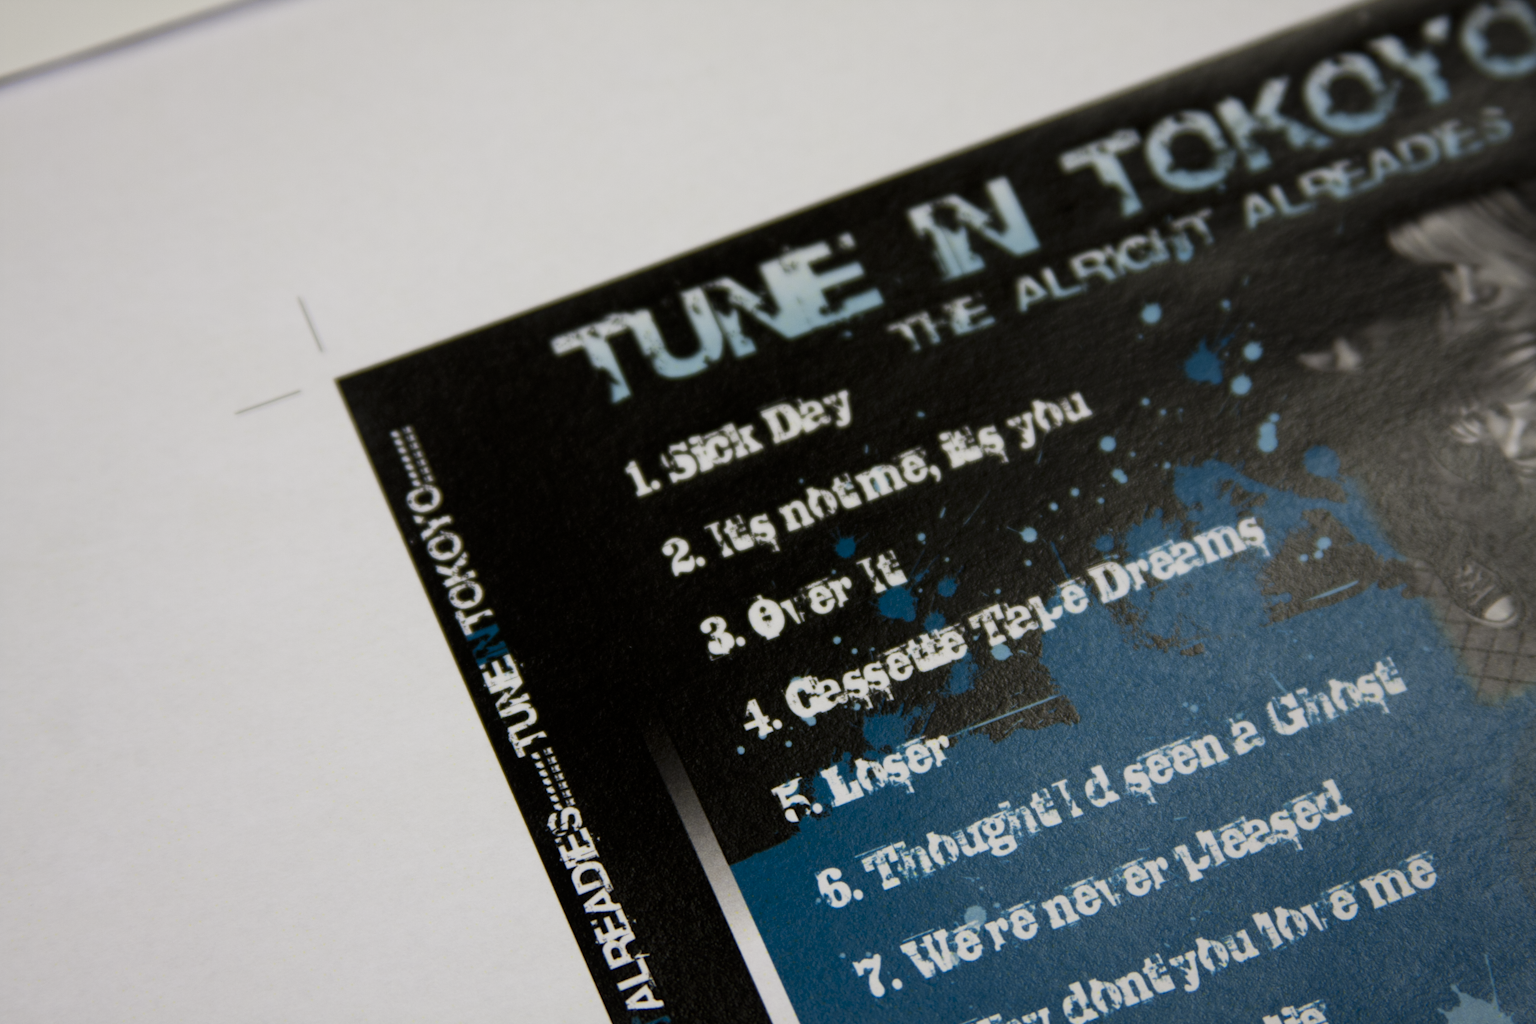 studio 101 cd cover